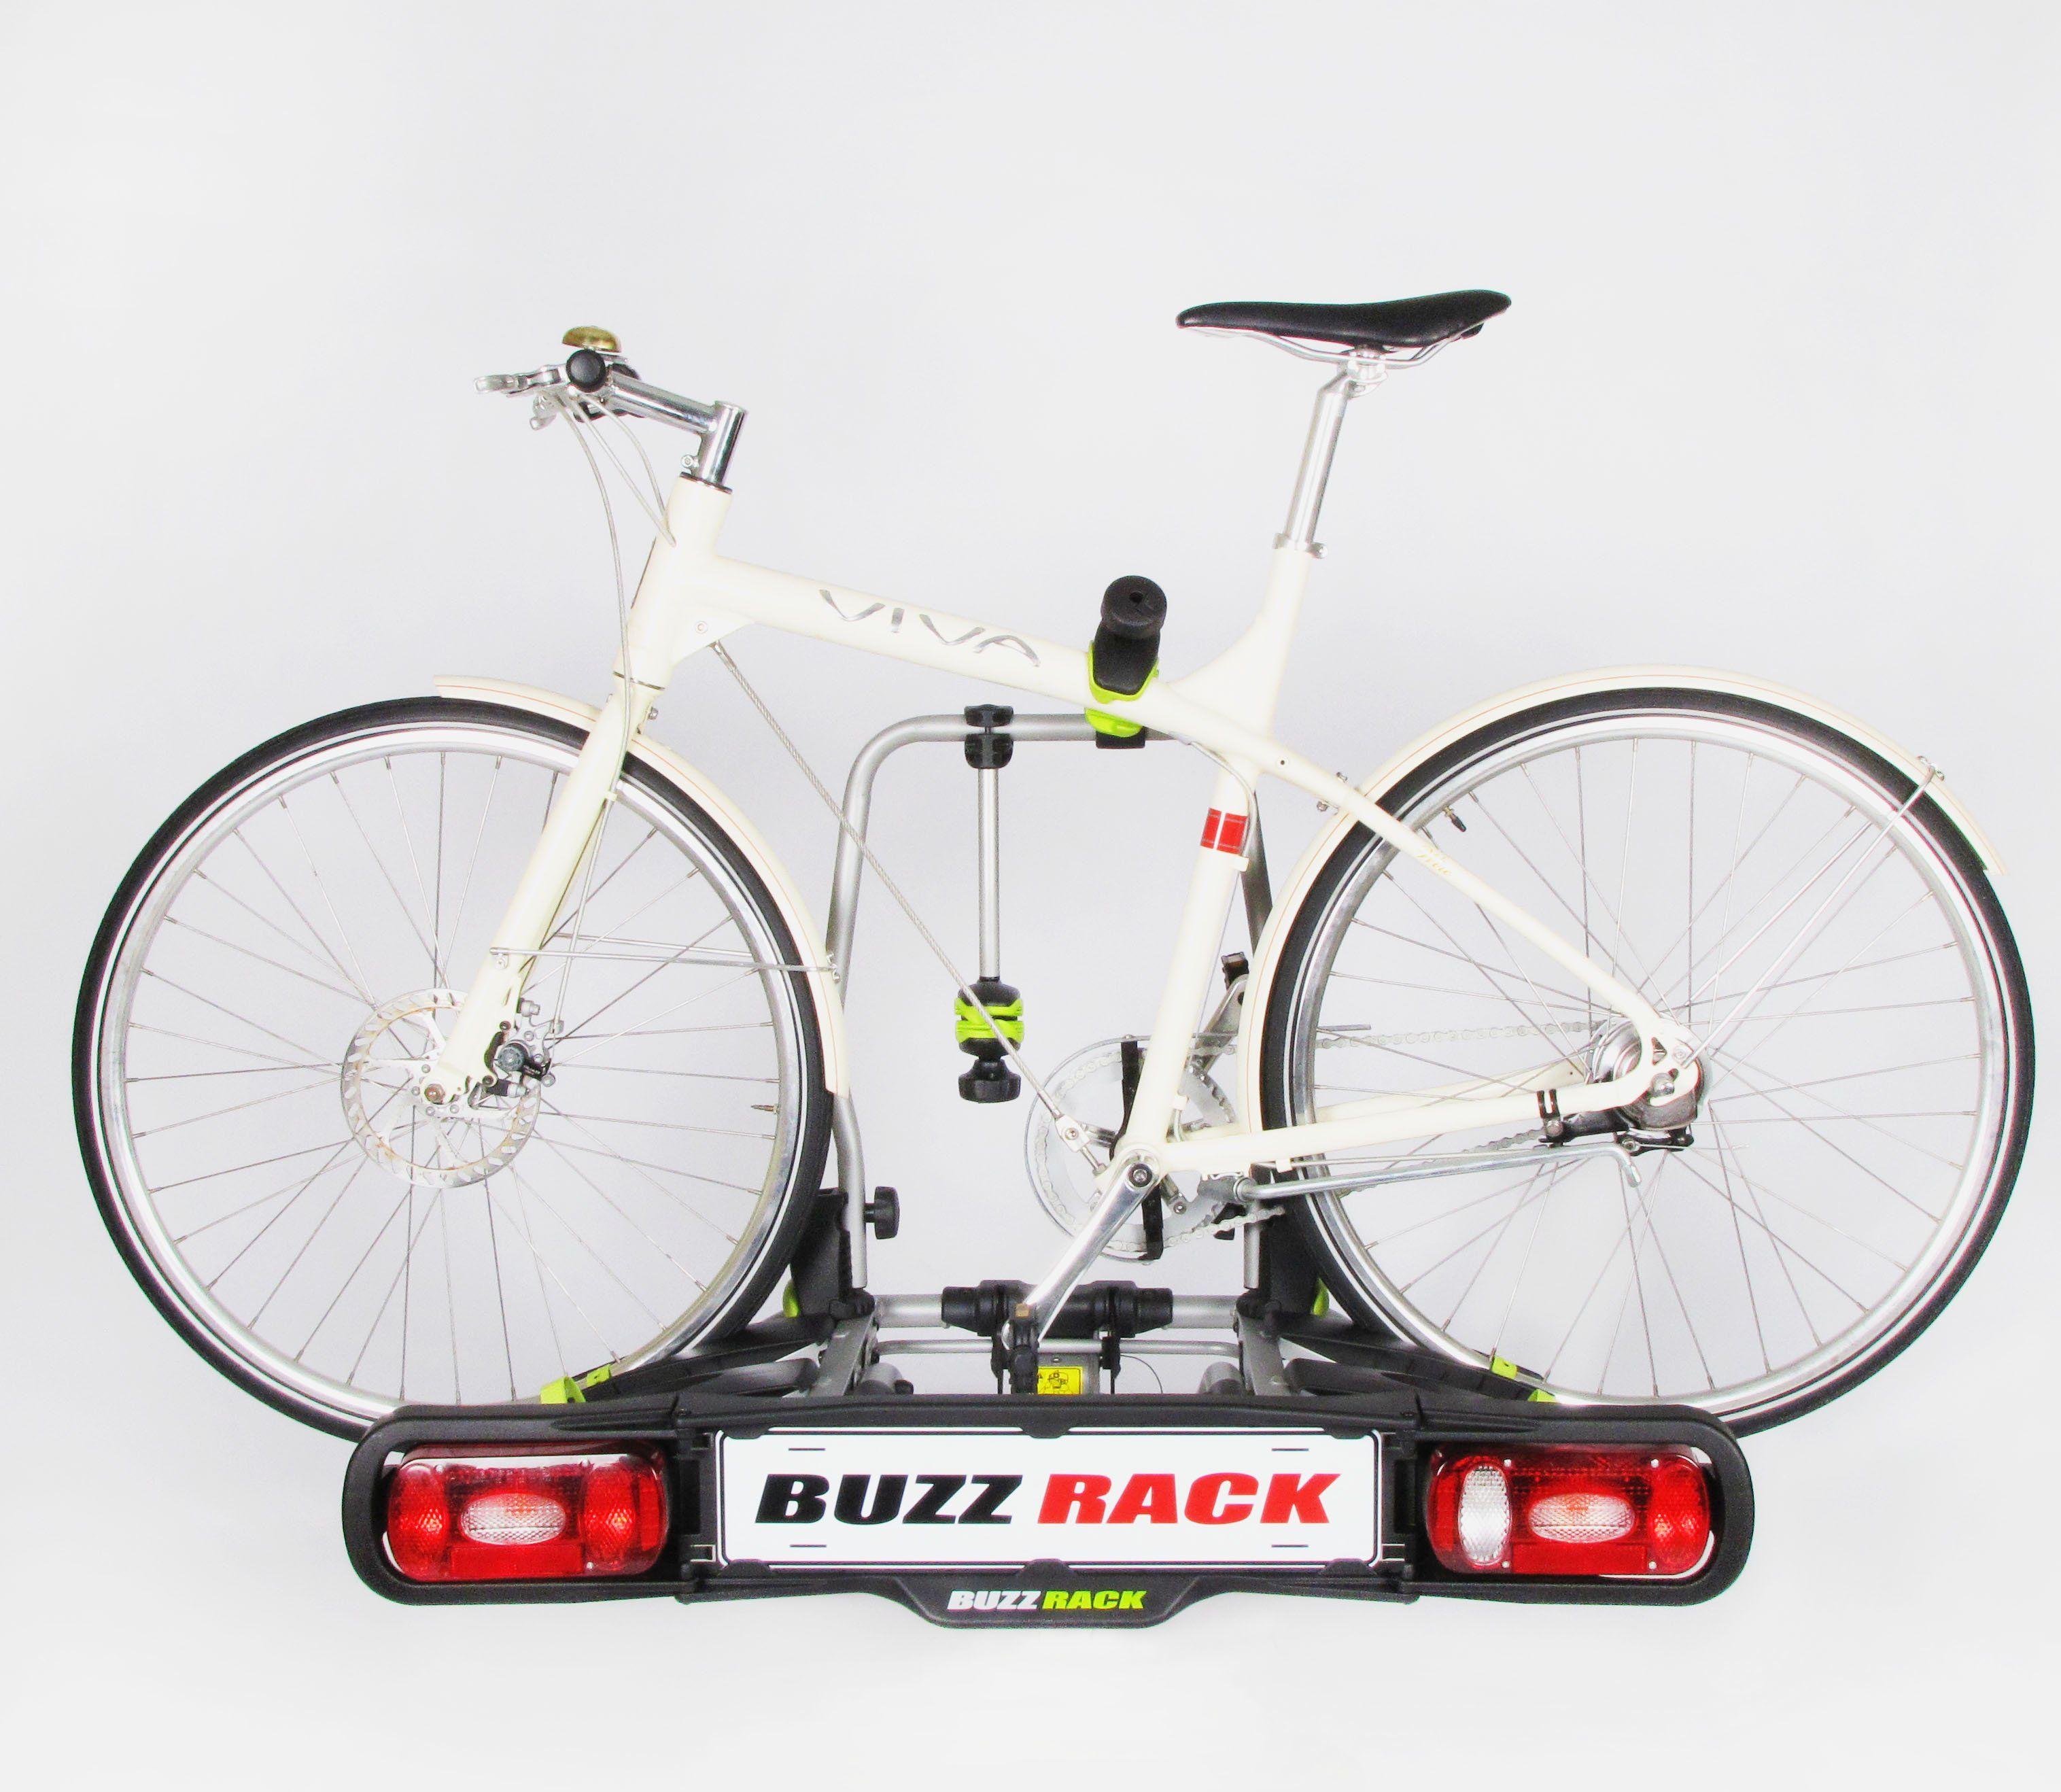 BUZZ RACK Easy Tilt 2 = £224.95 bike cycle RackEmUp